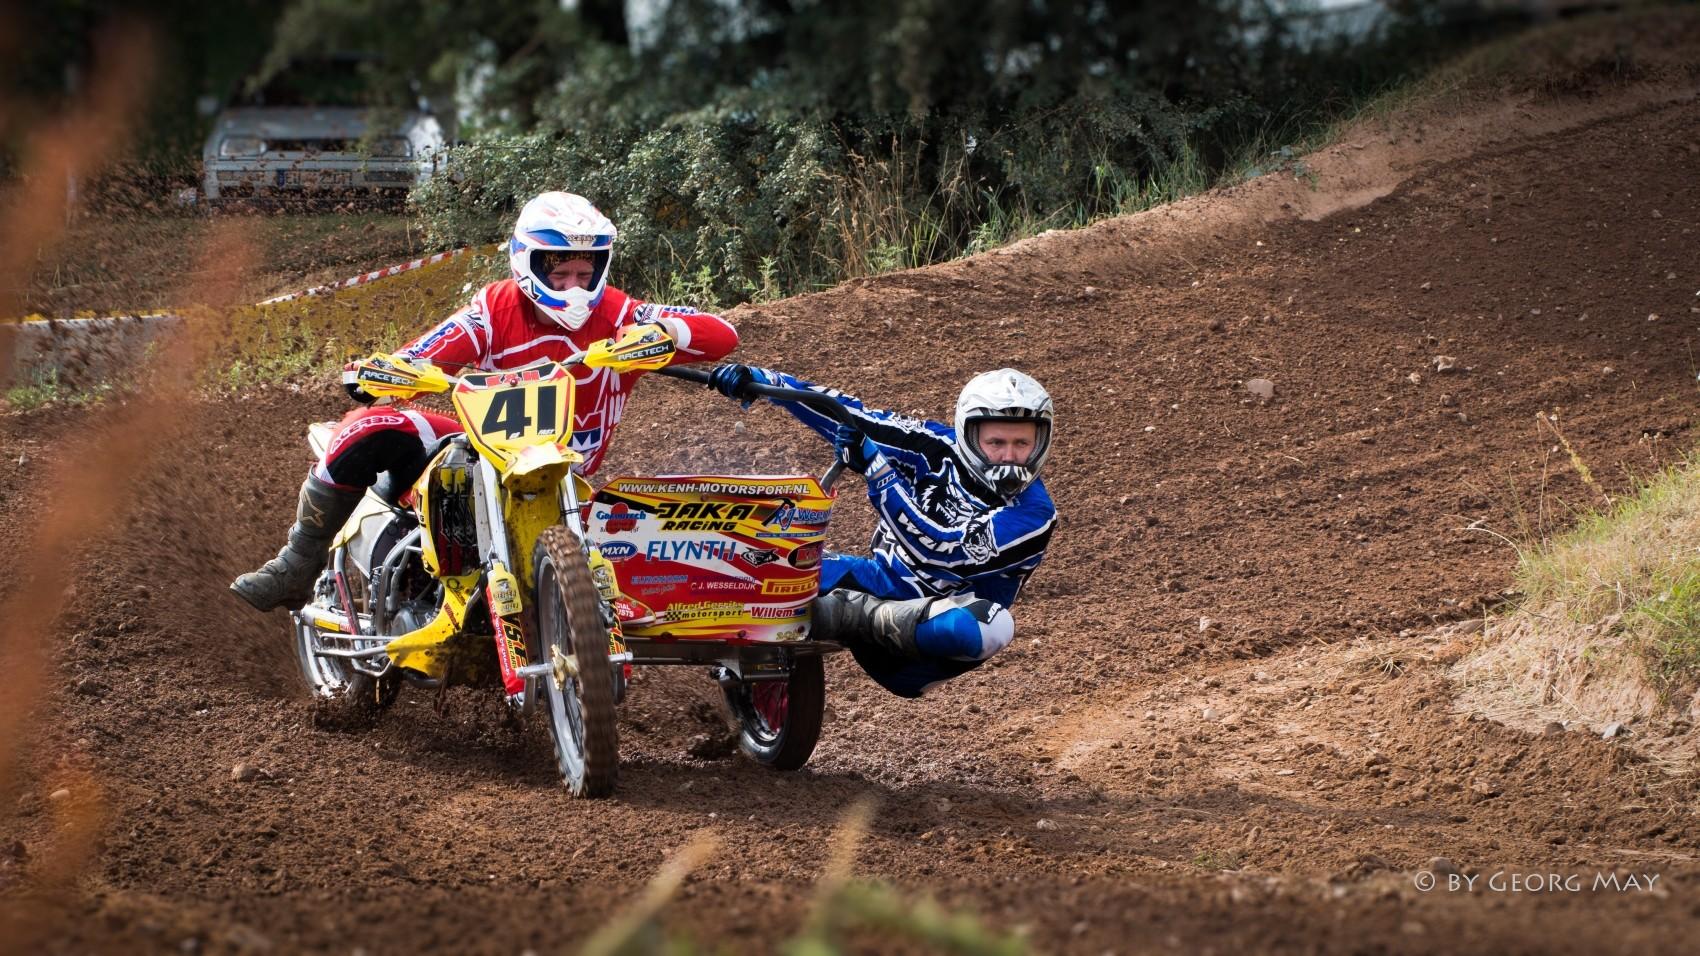 Motocross-Gespann